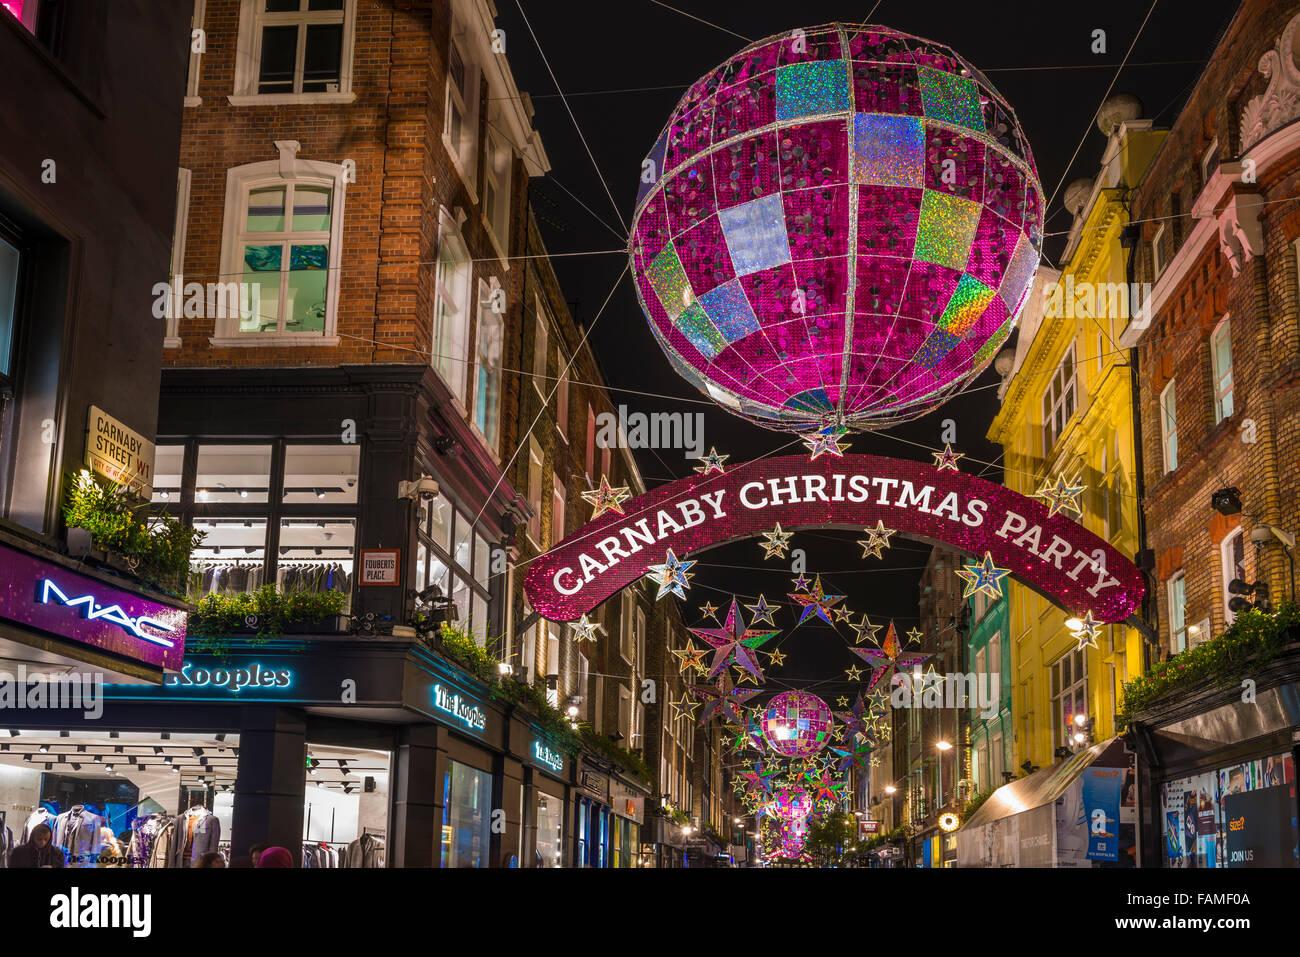 Christmas lights on Carnaby Street, London UK - Stock Image